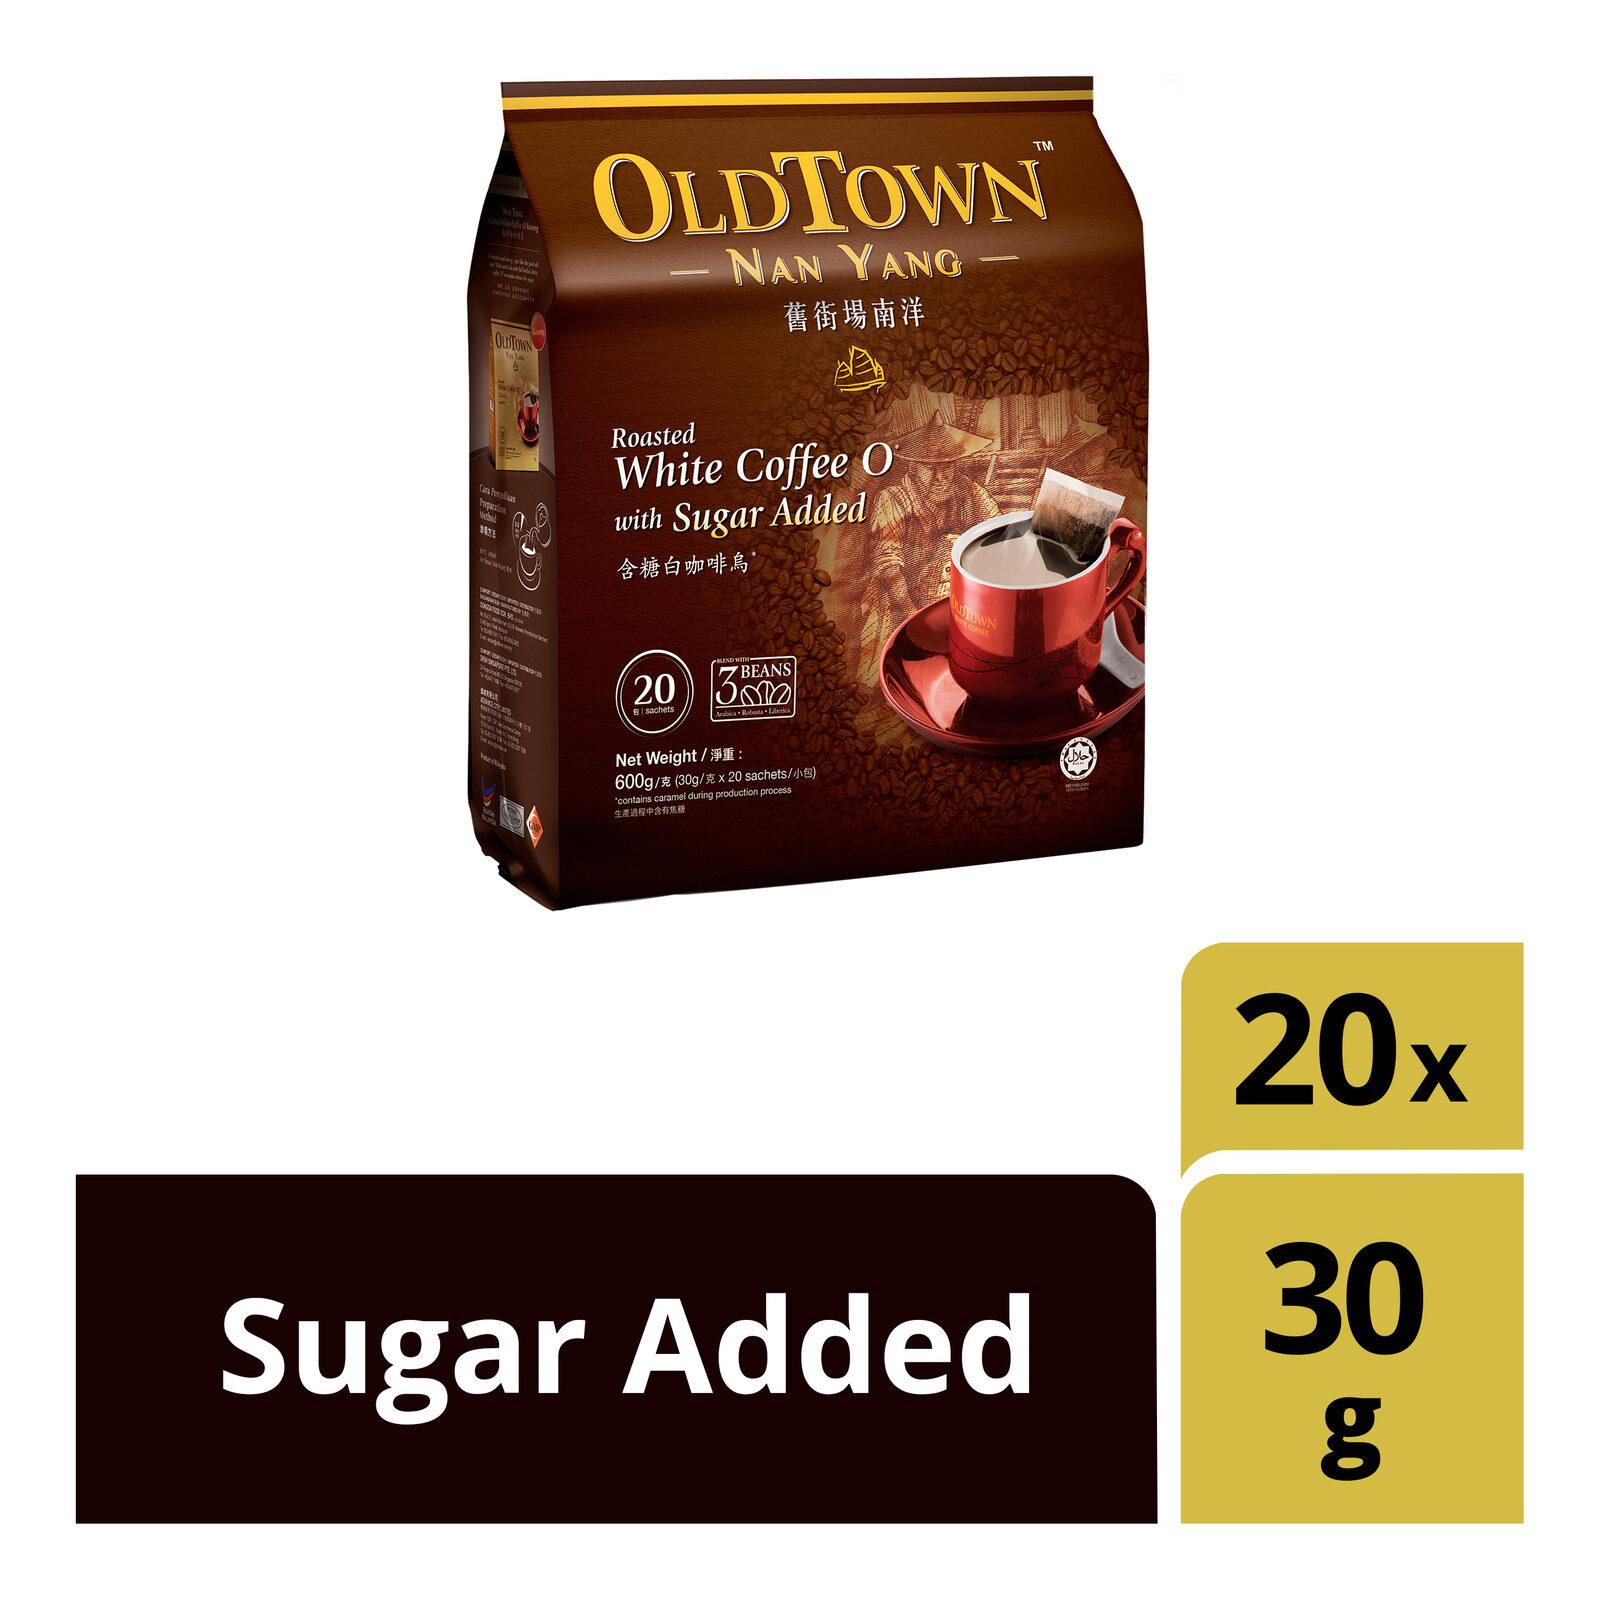 OLDTOWN Nan Yang Roasted White Coffee O KOPI-O Sugar Added (20 Sachets X 1 pack)